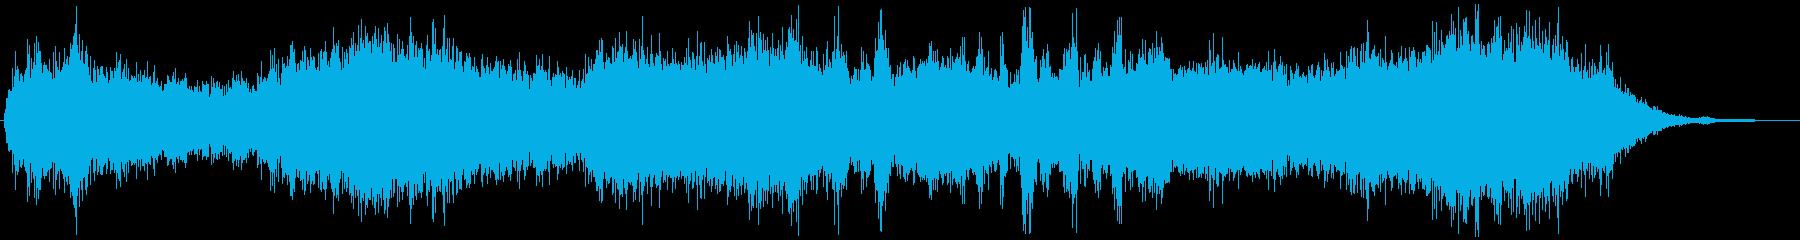 PADS スクラッチ性01の再生済みの波形